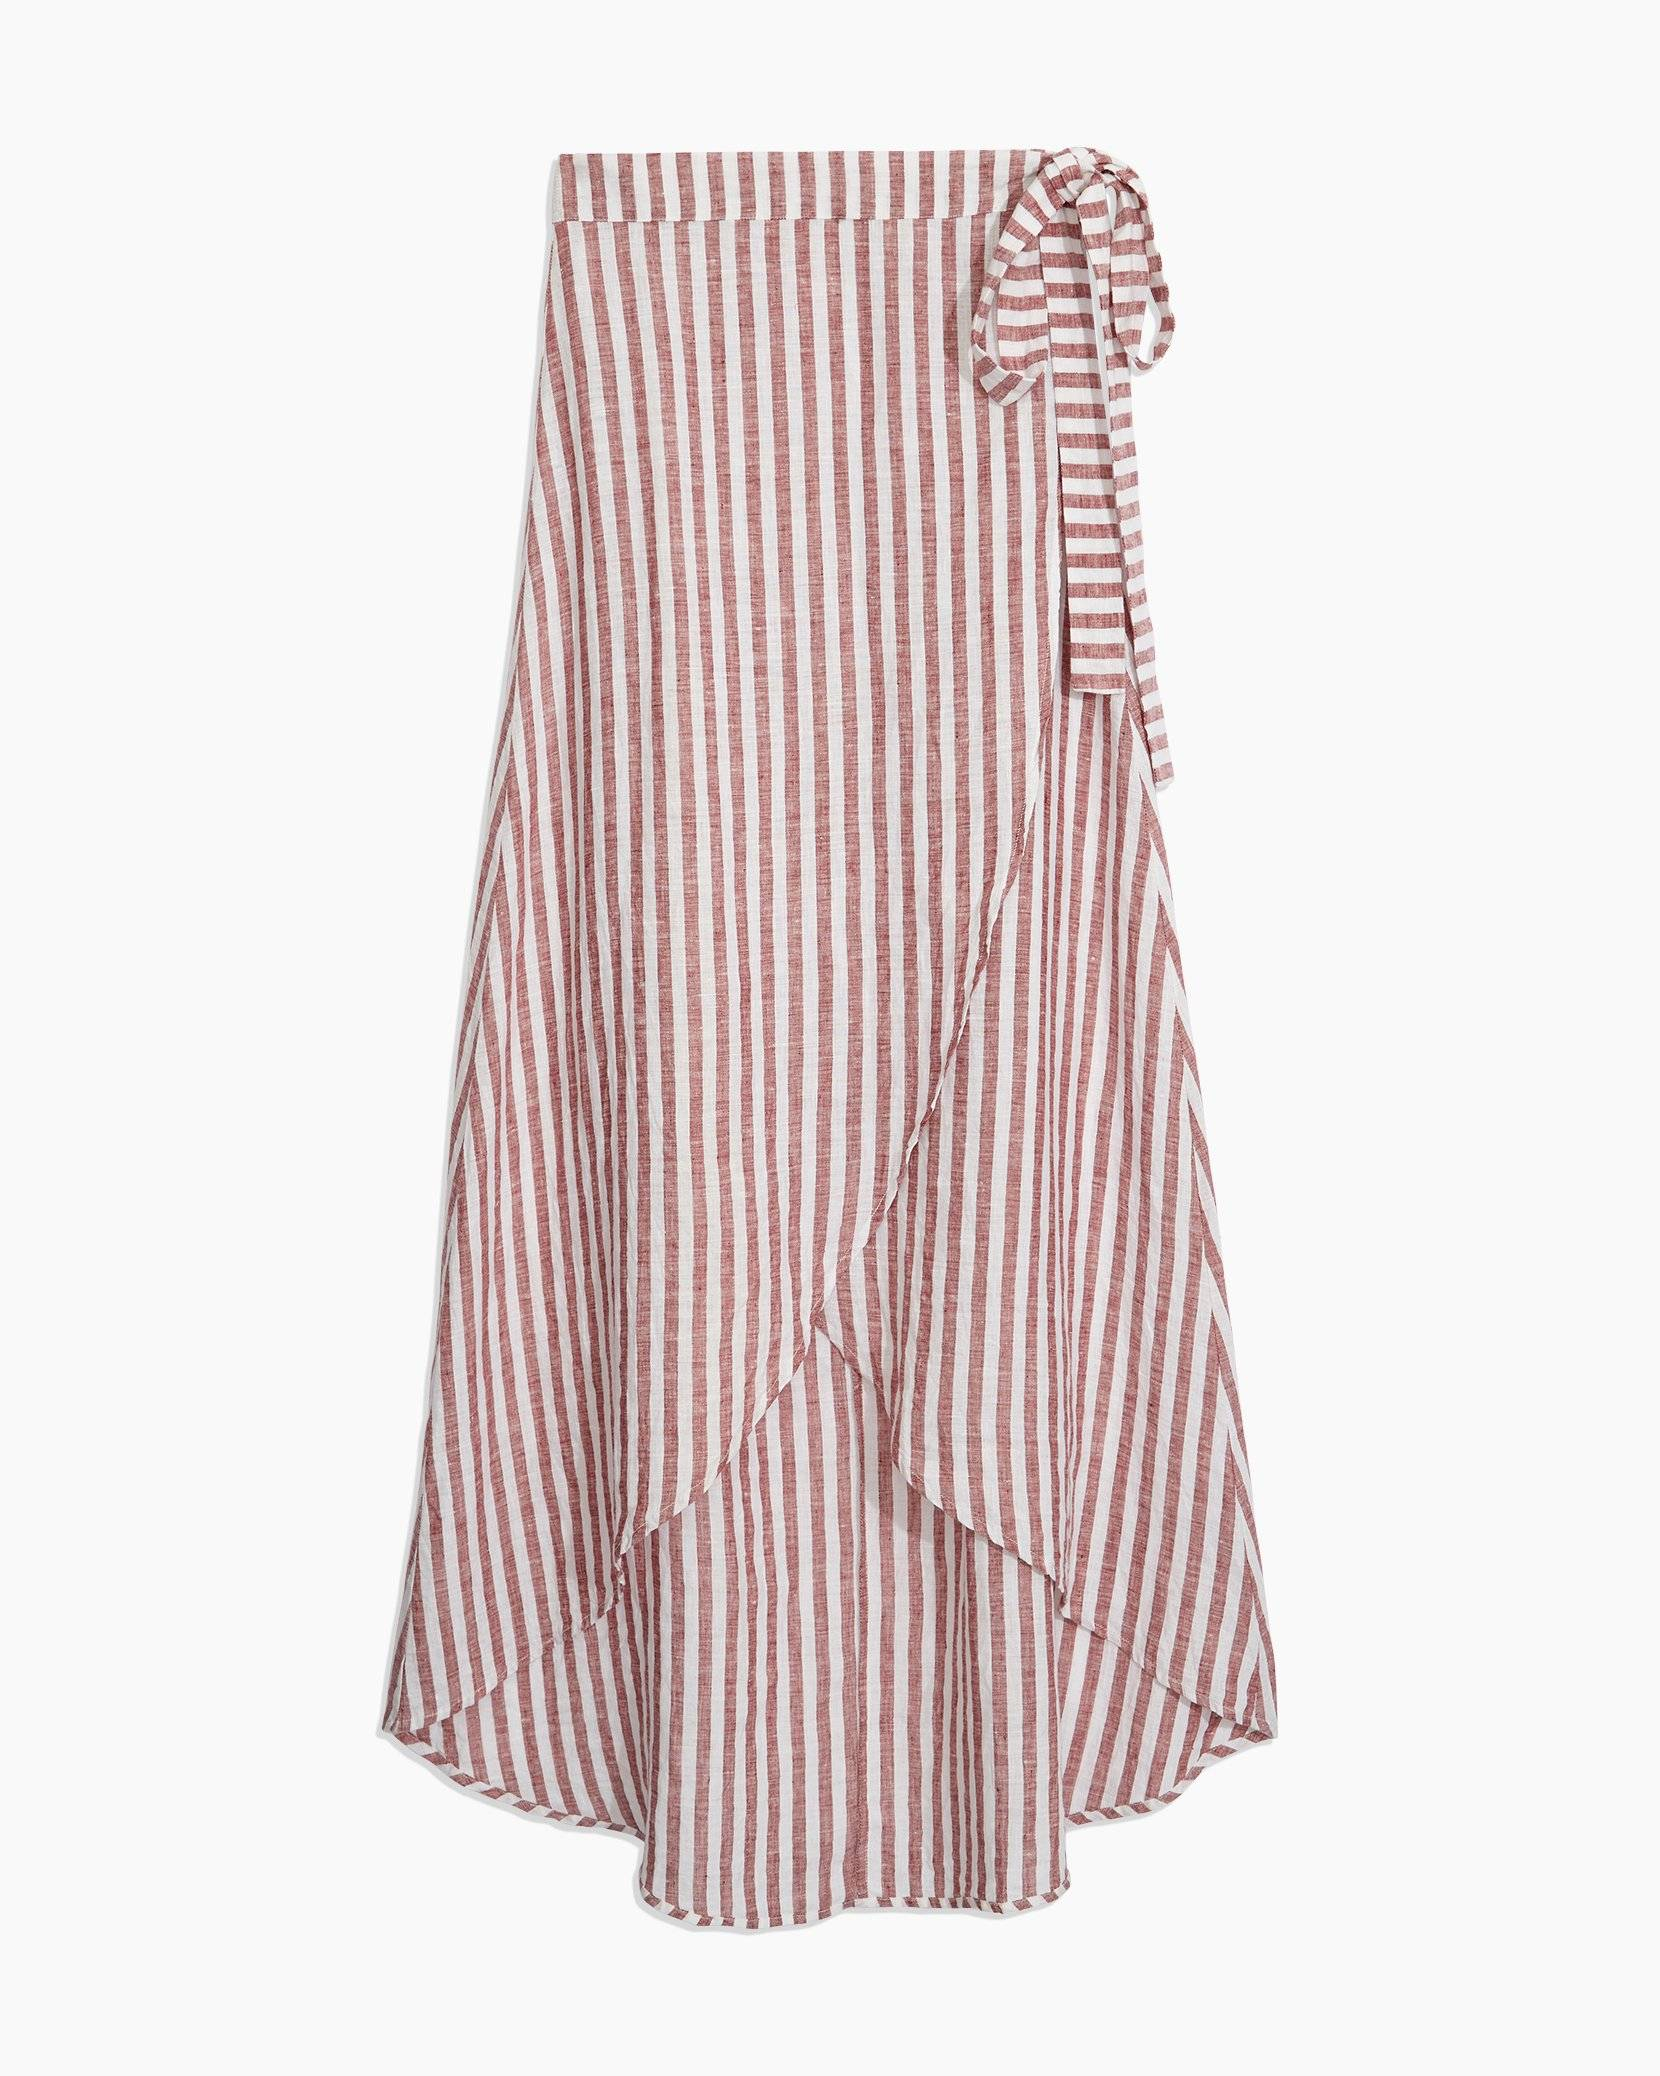 Amanda Macro Stripe Skirt